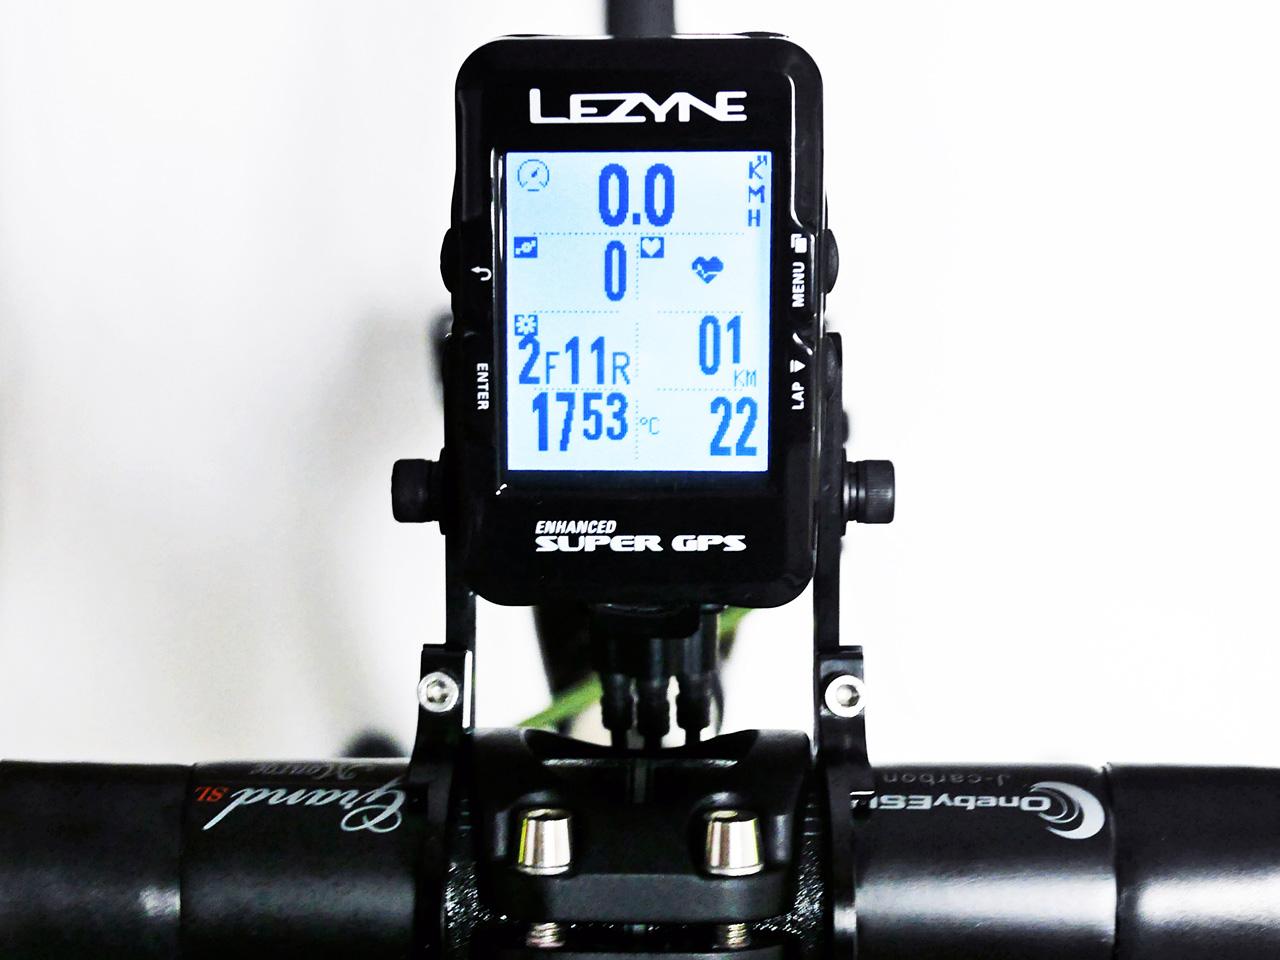 LEZYNE SUPER GPS シフトインジケーター表示